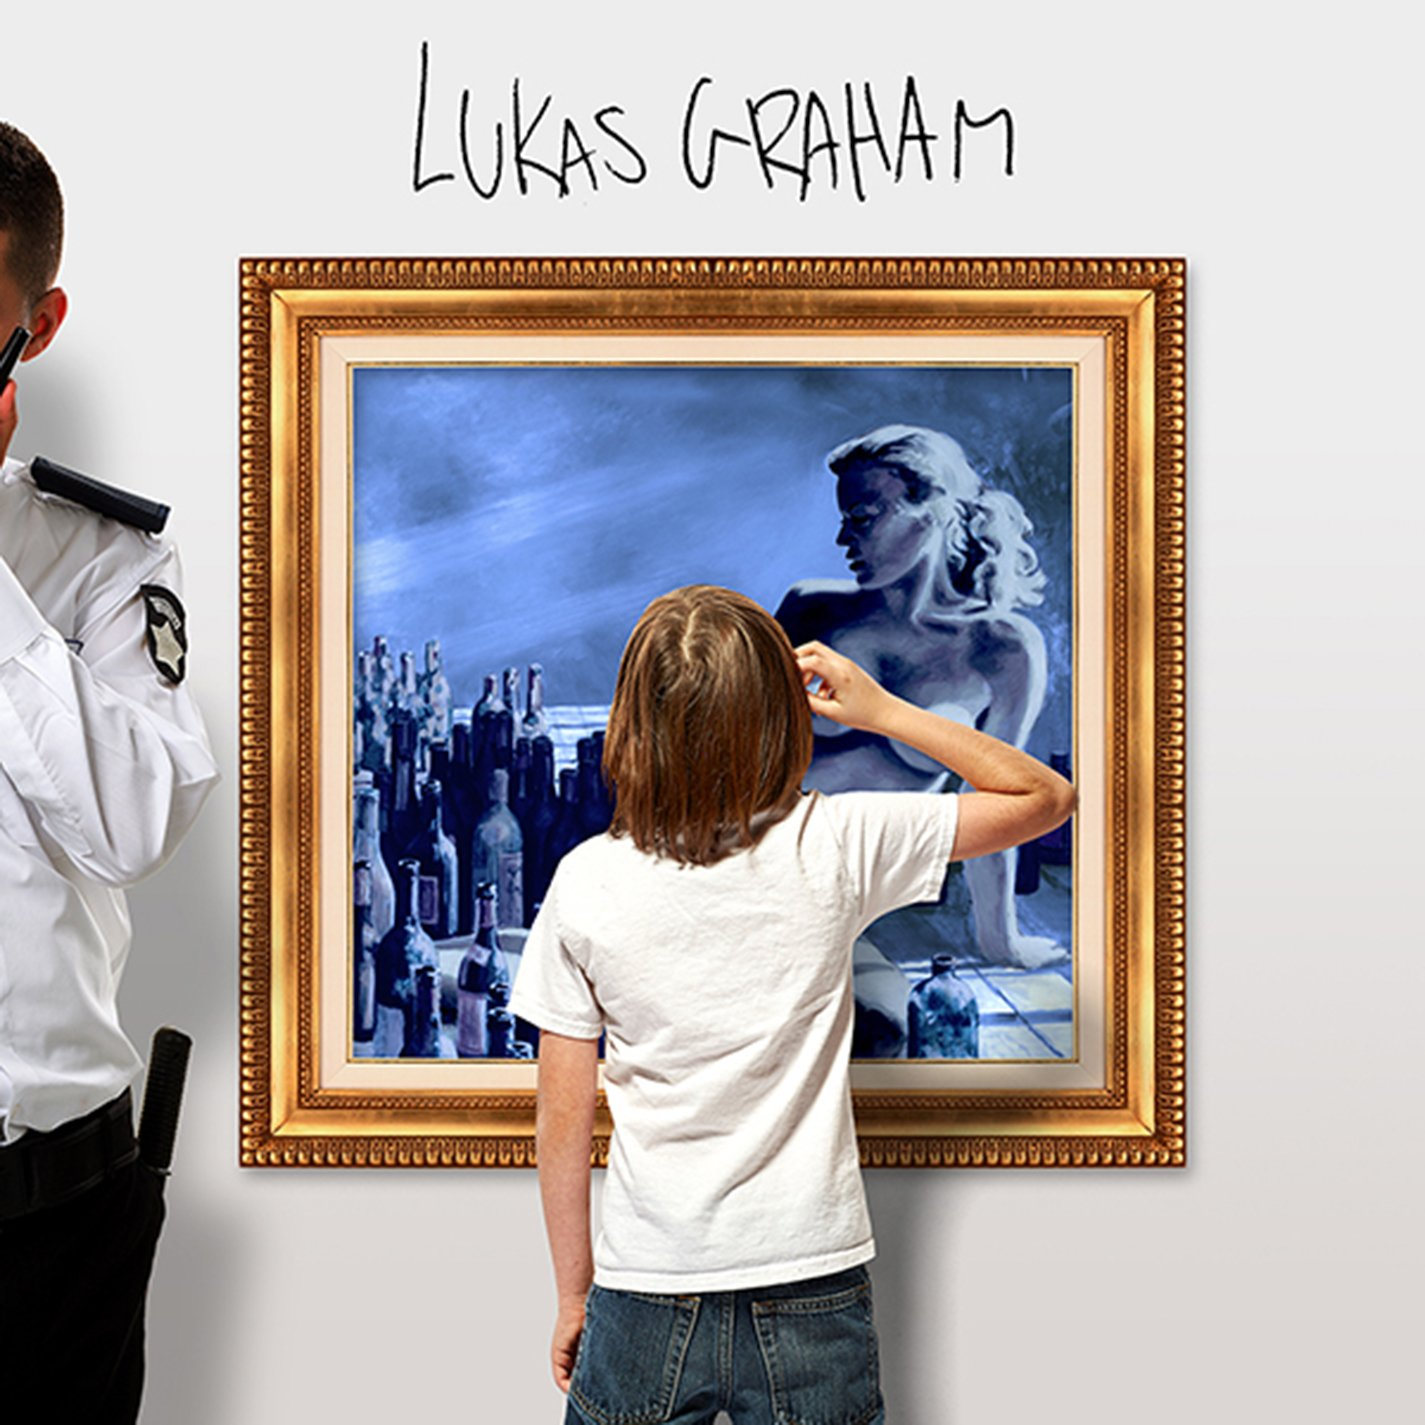 Vinilo : Lukas Graham - Lukas Graham (LP Vinyl)